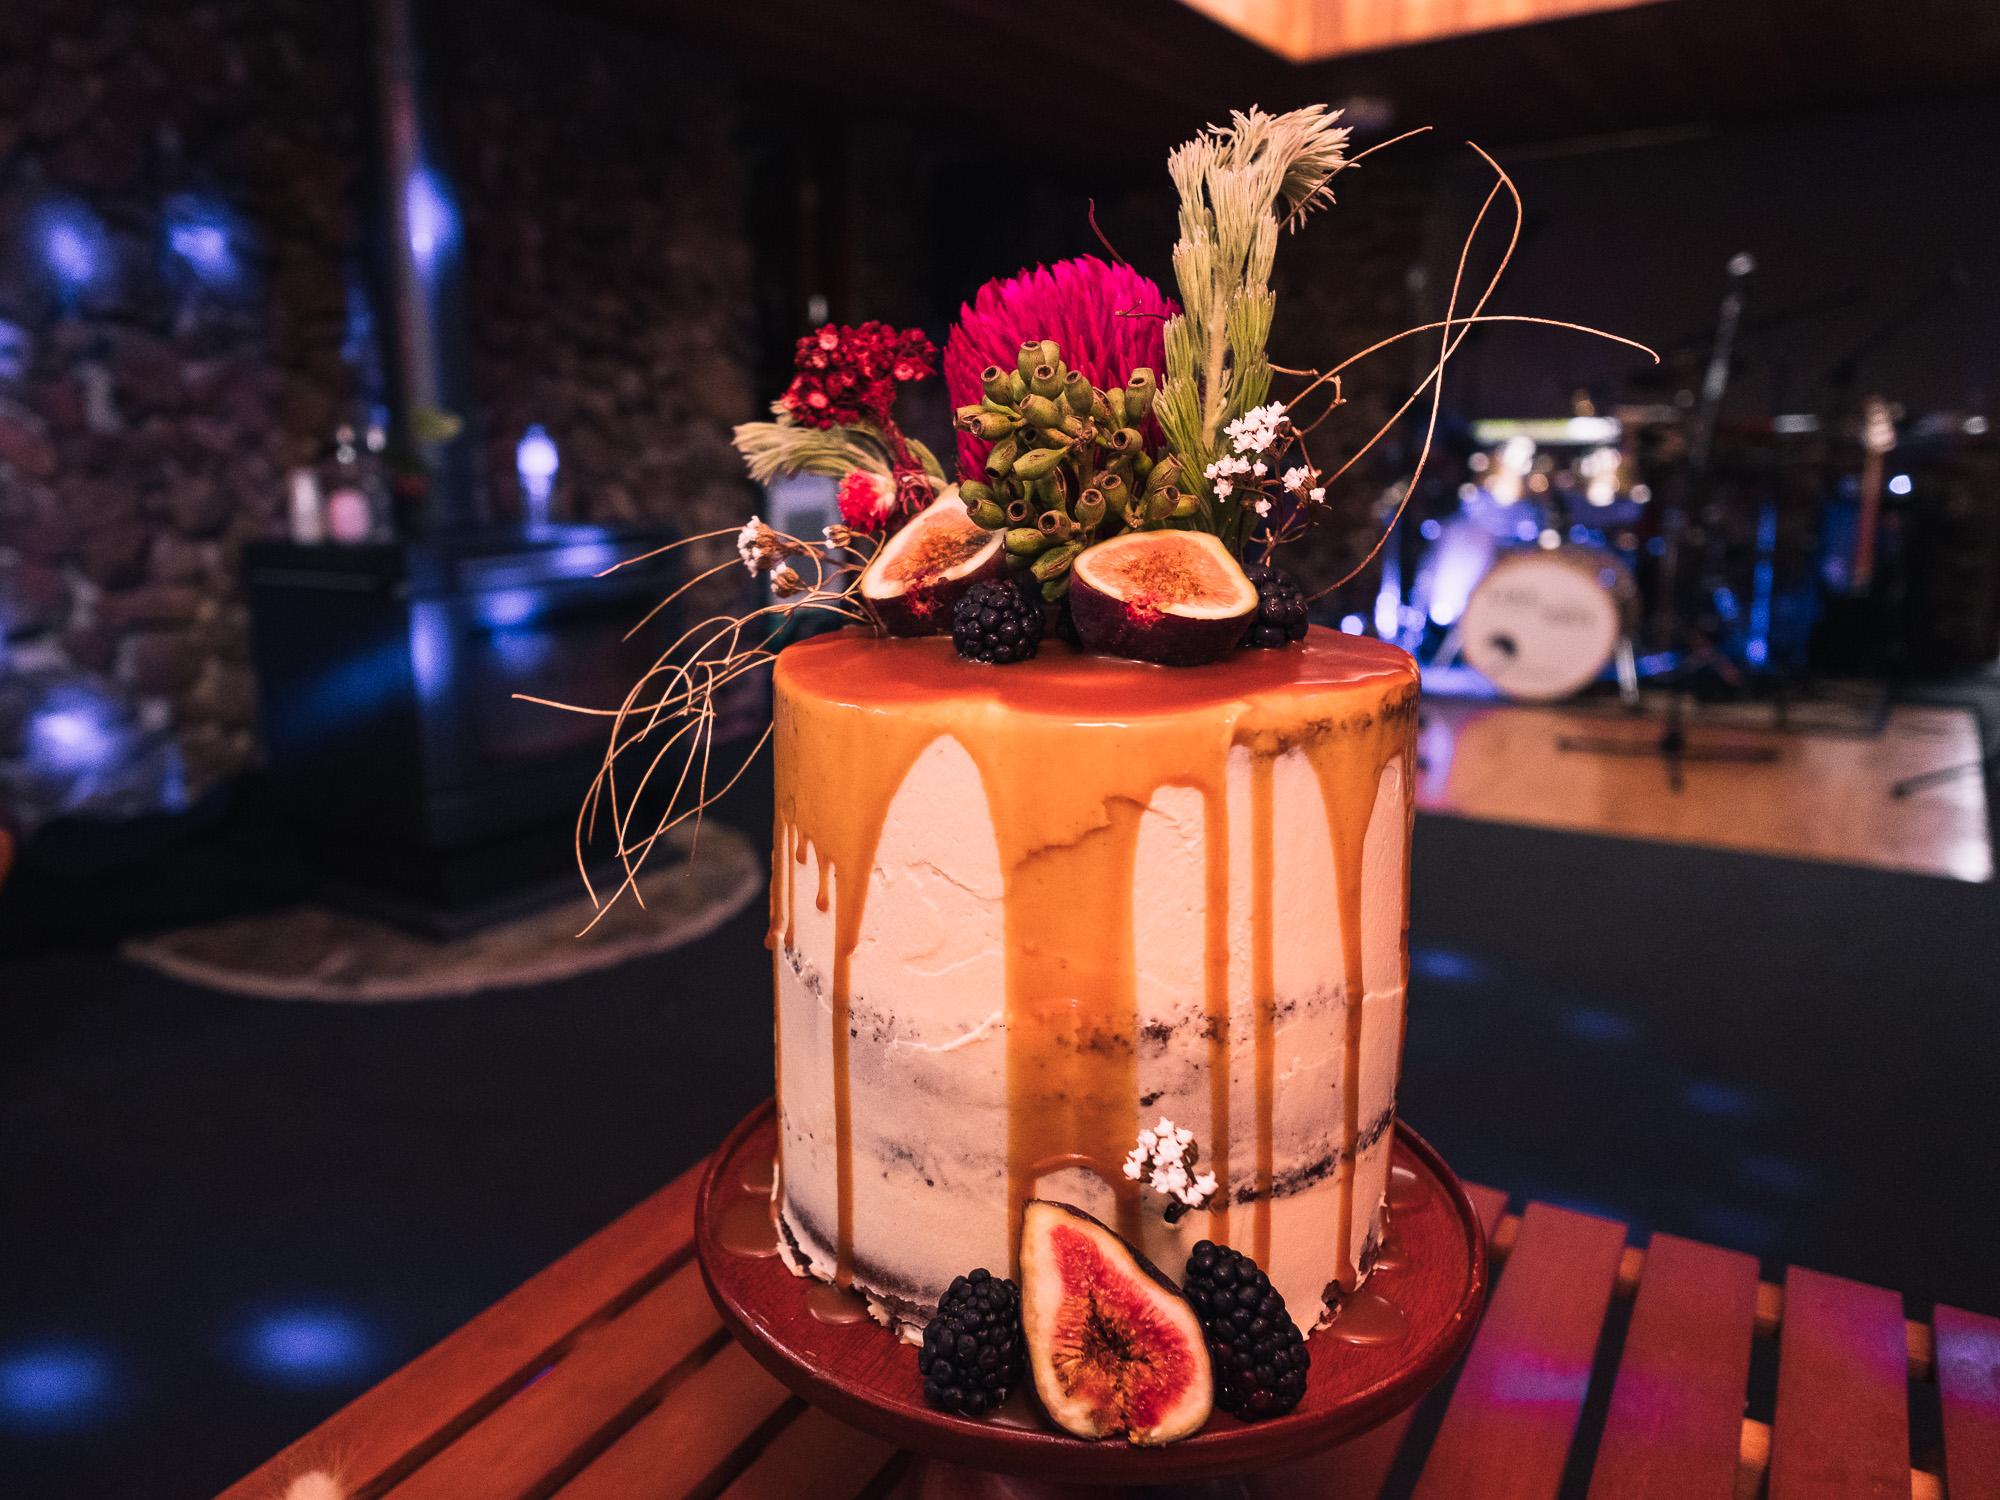 Melbourne Sunnystones Camp Wedding - wedding cake